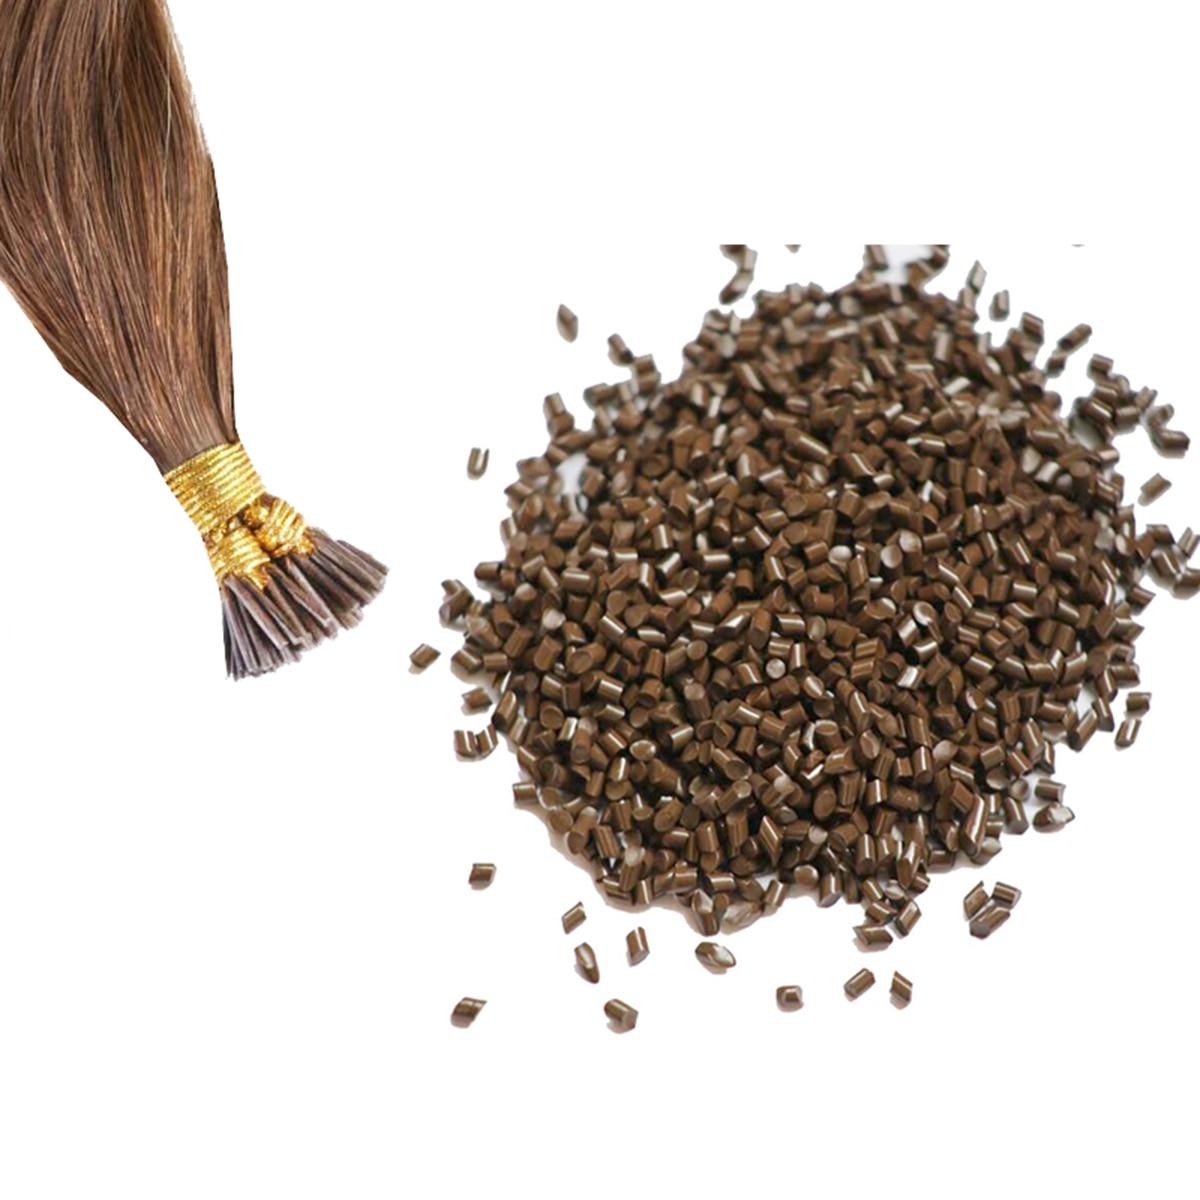 1000g ITALY  GLUE BEADS Keratin Glue Granules Beads Grains Hair Extensions Brown color hair glue beads